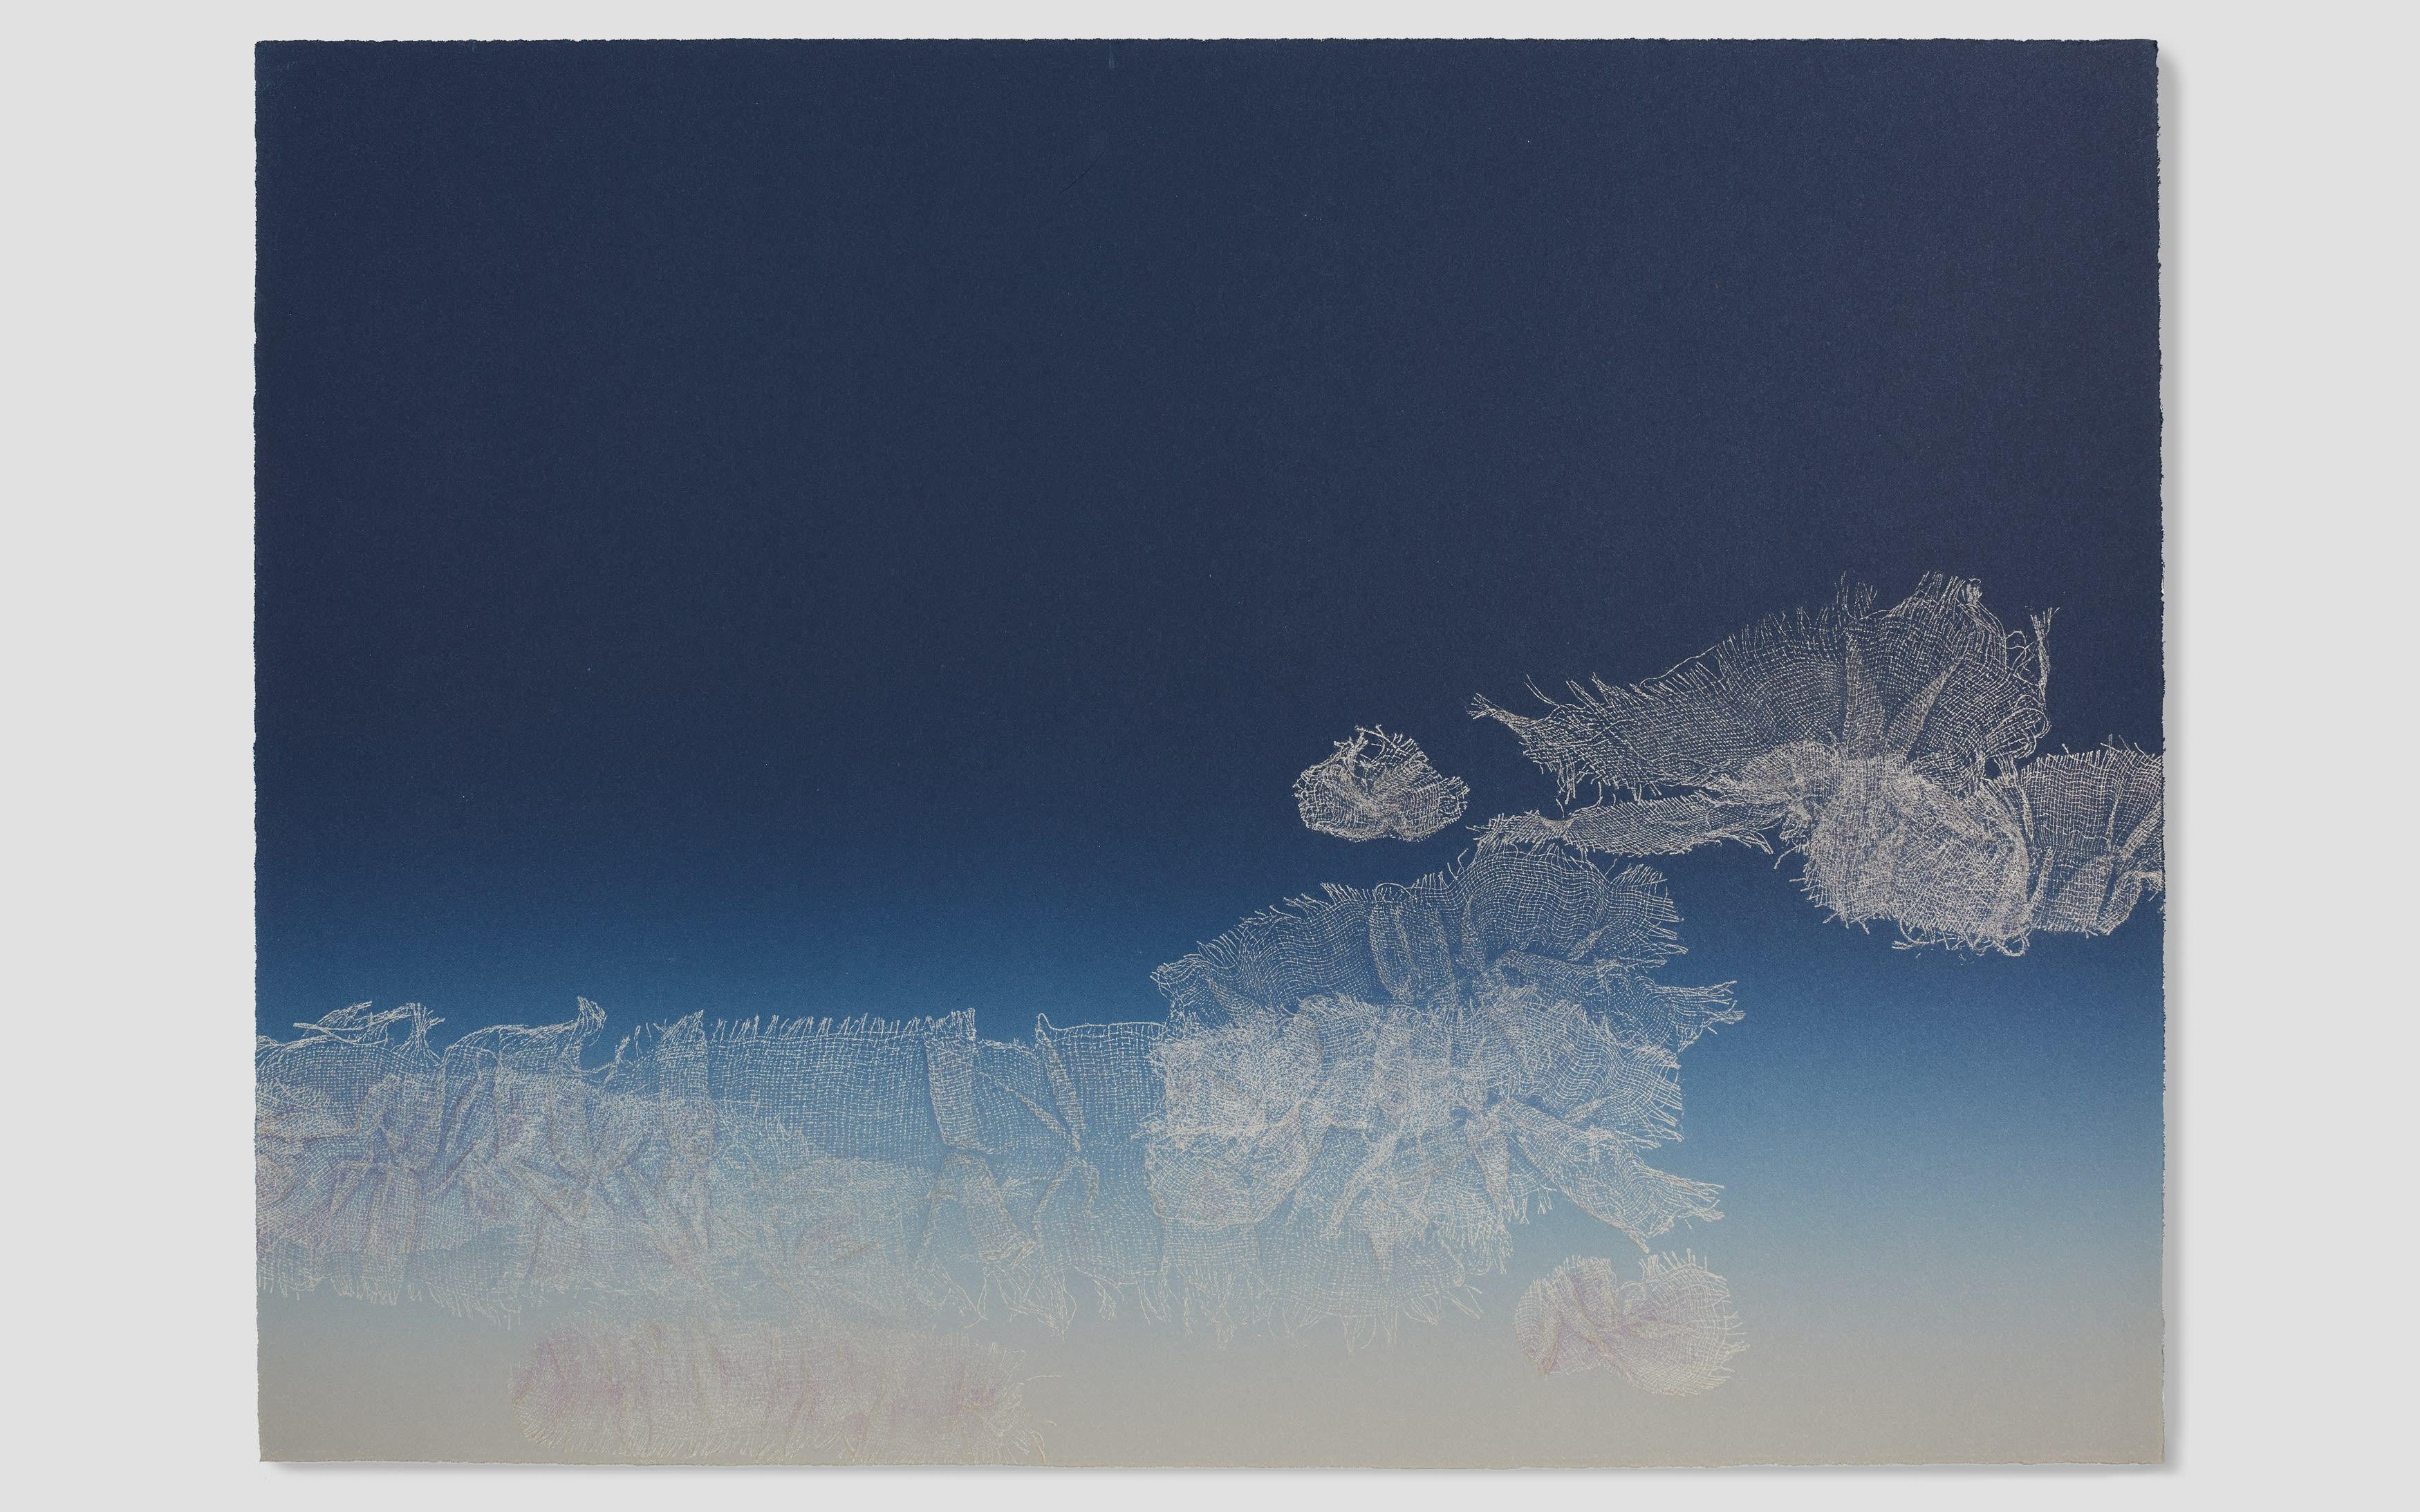 Gail Gash Taylor Print- Zane Bennett Gallery